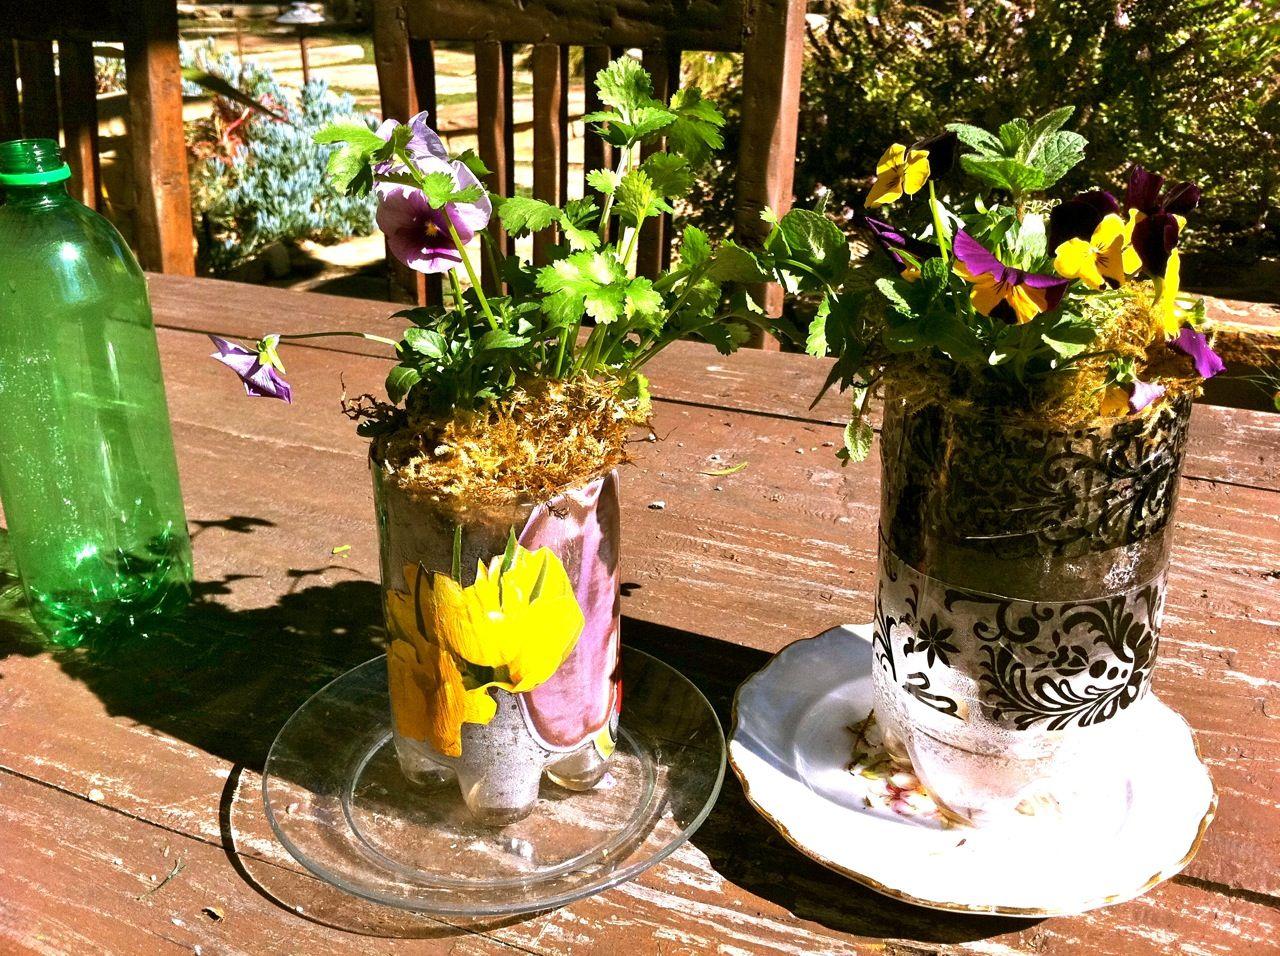 self watering planters made from repurposed plastic soda bottles